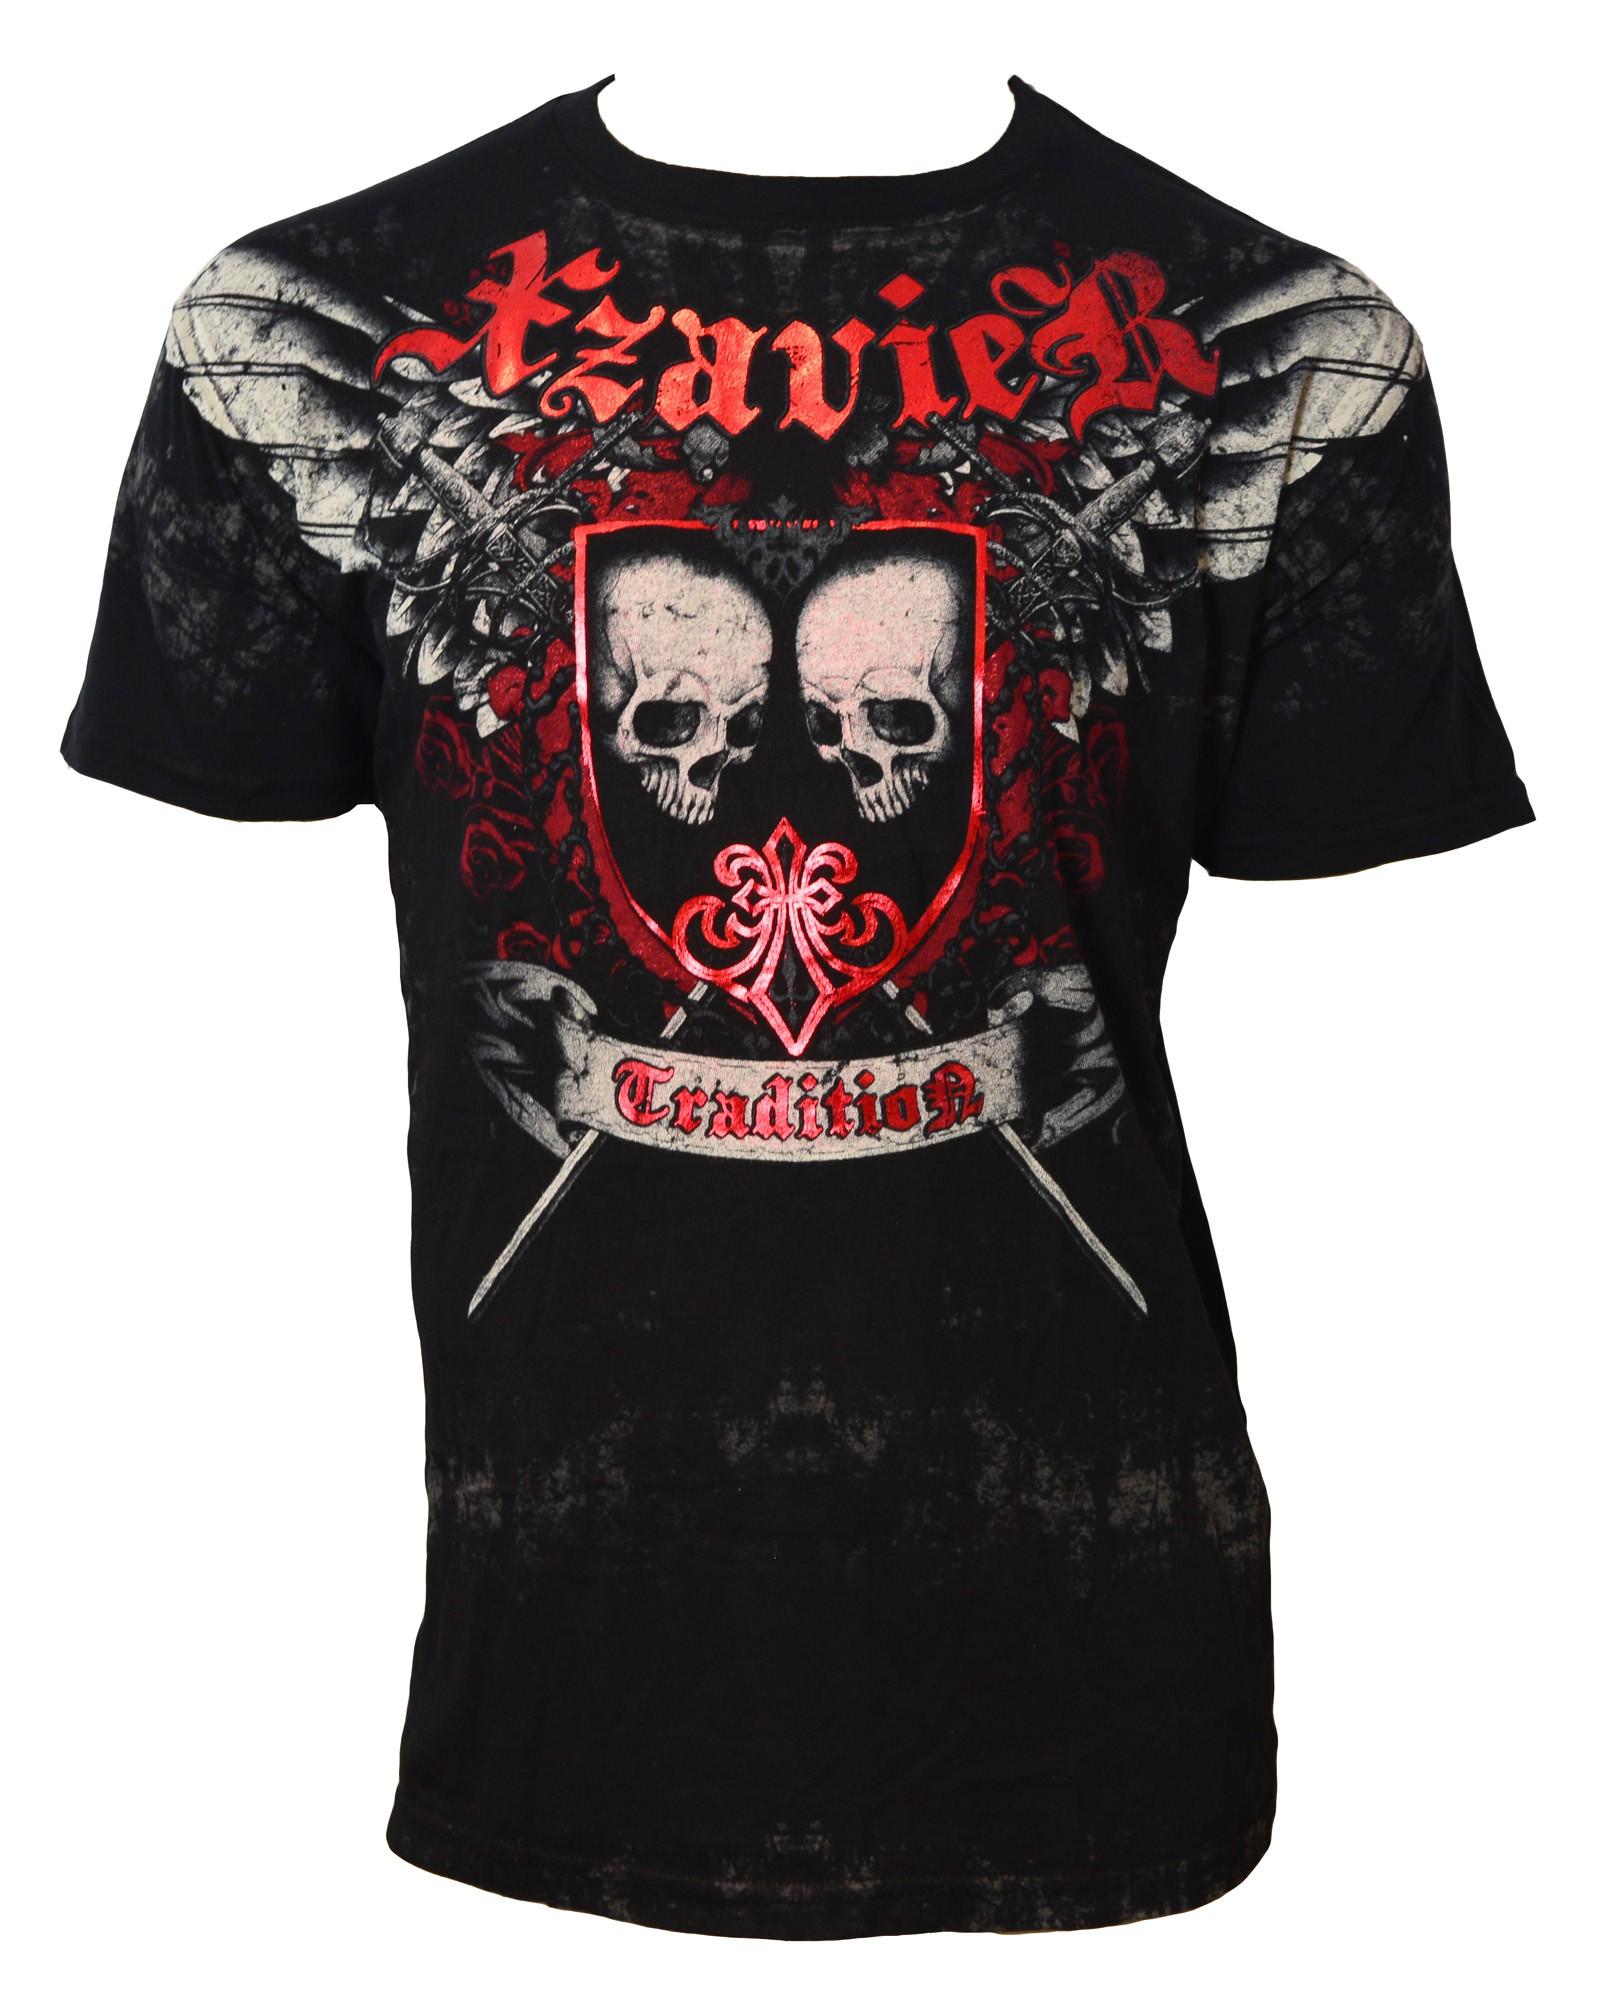 Xzavier - Tradition Skulls T-Shirt